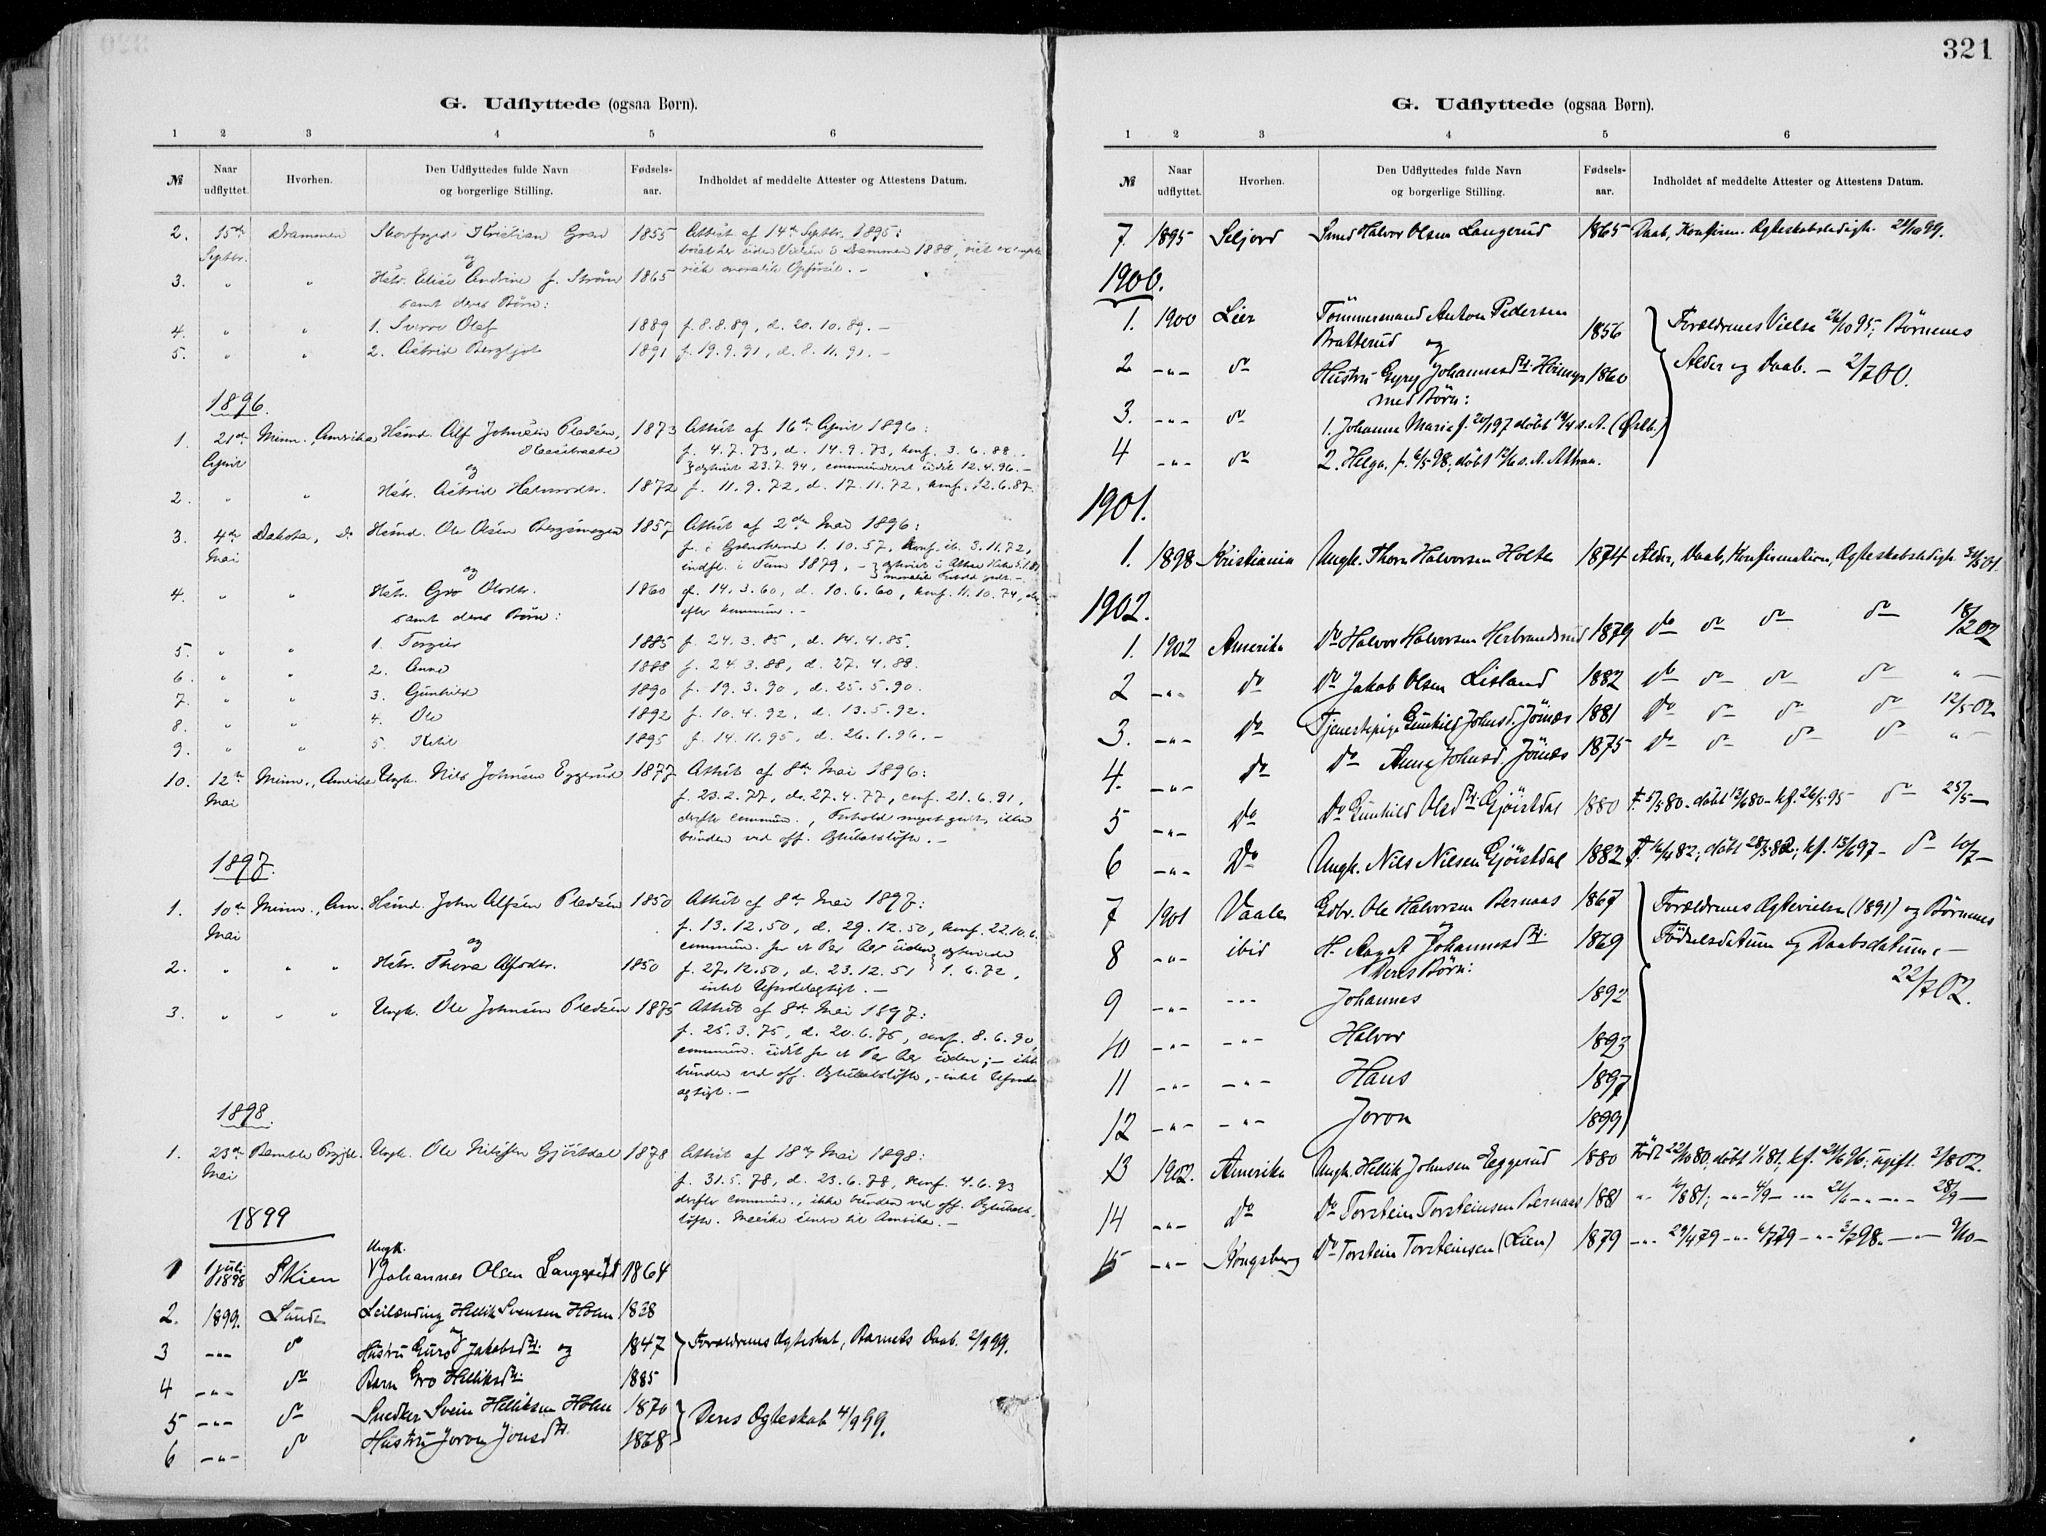 SAKO, Tinn kirkebøker, F/Fa/L0007: Ministerialbok nr. I 7, 1878-1922, s. 321